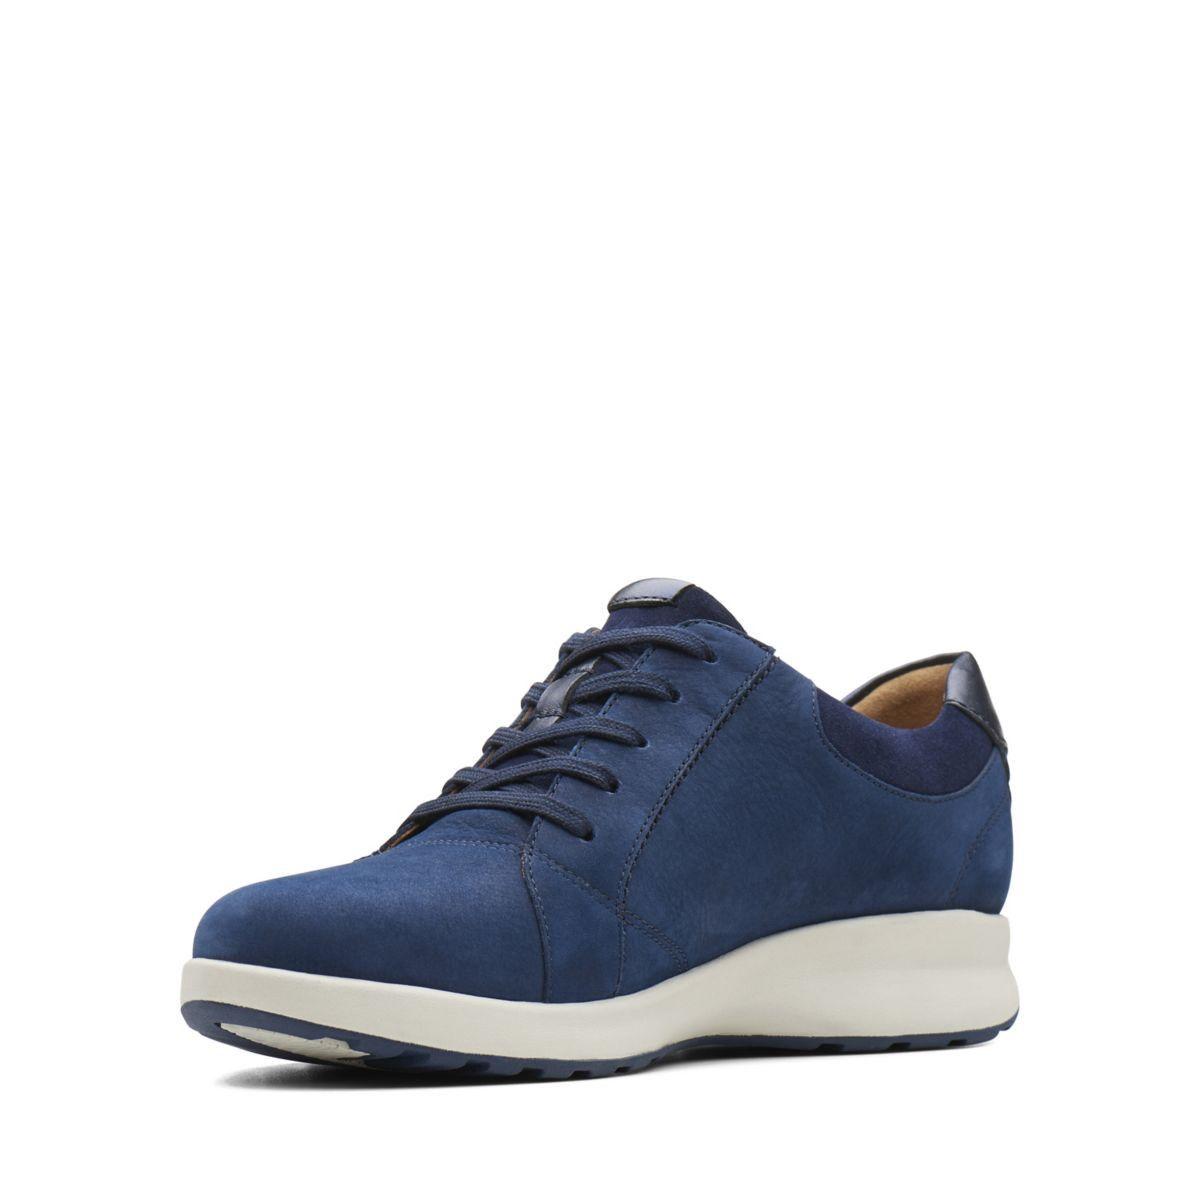 d204a321c0 Clarks Un Adorn Lace - Womens Shoes Navy Combination 9.5 E (Wide) Out Of  Stock